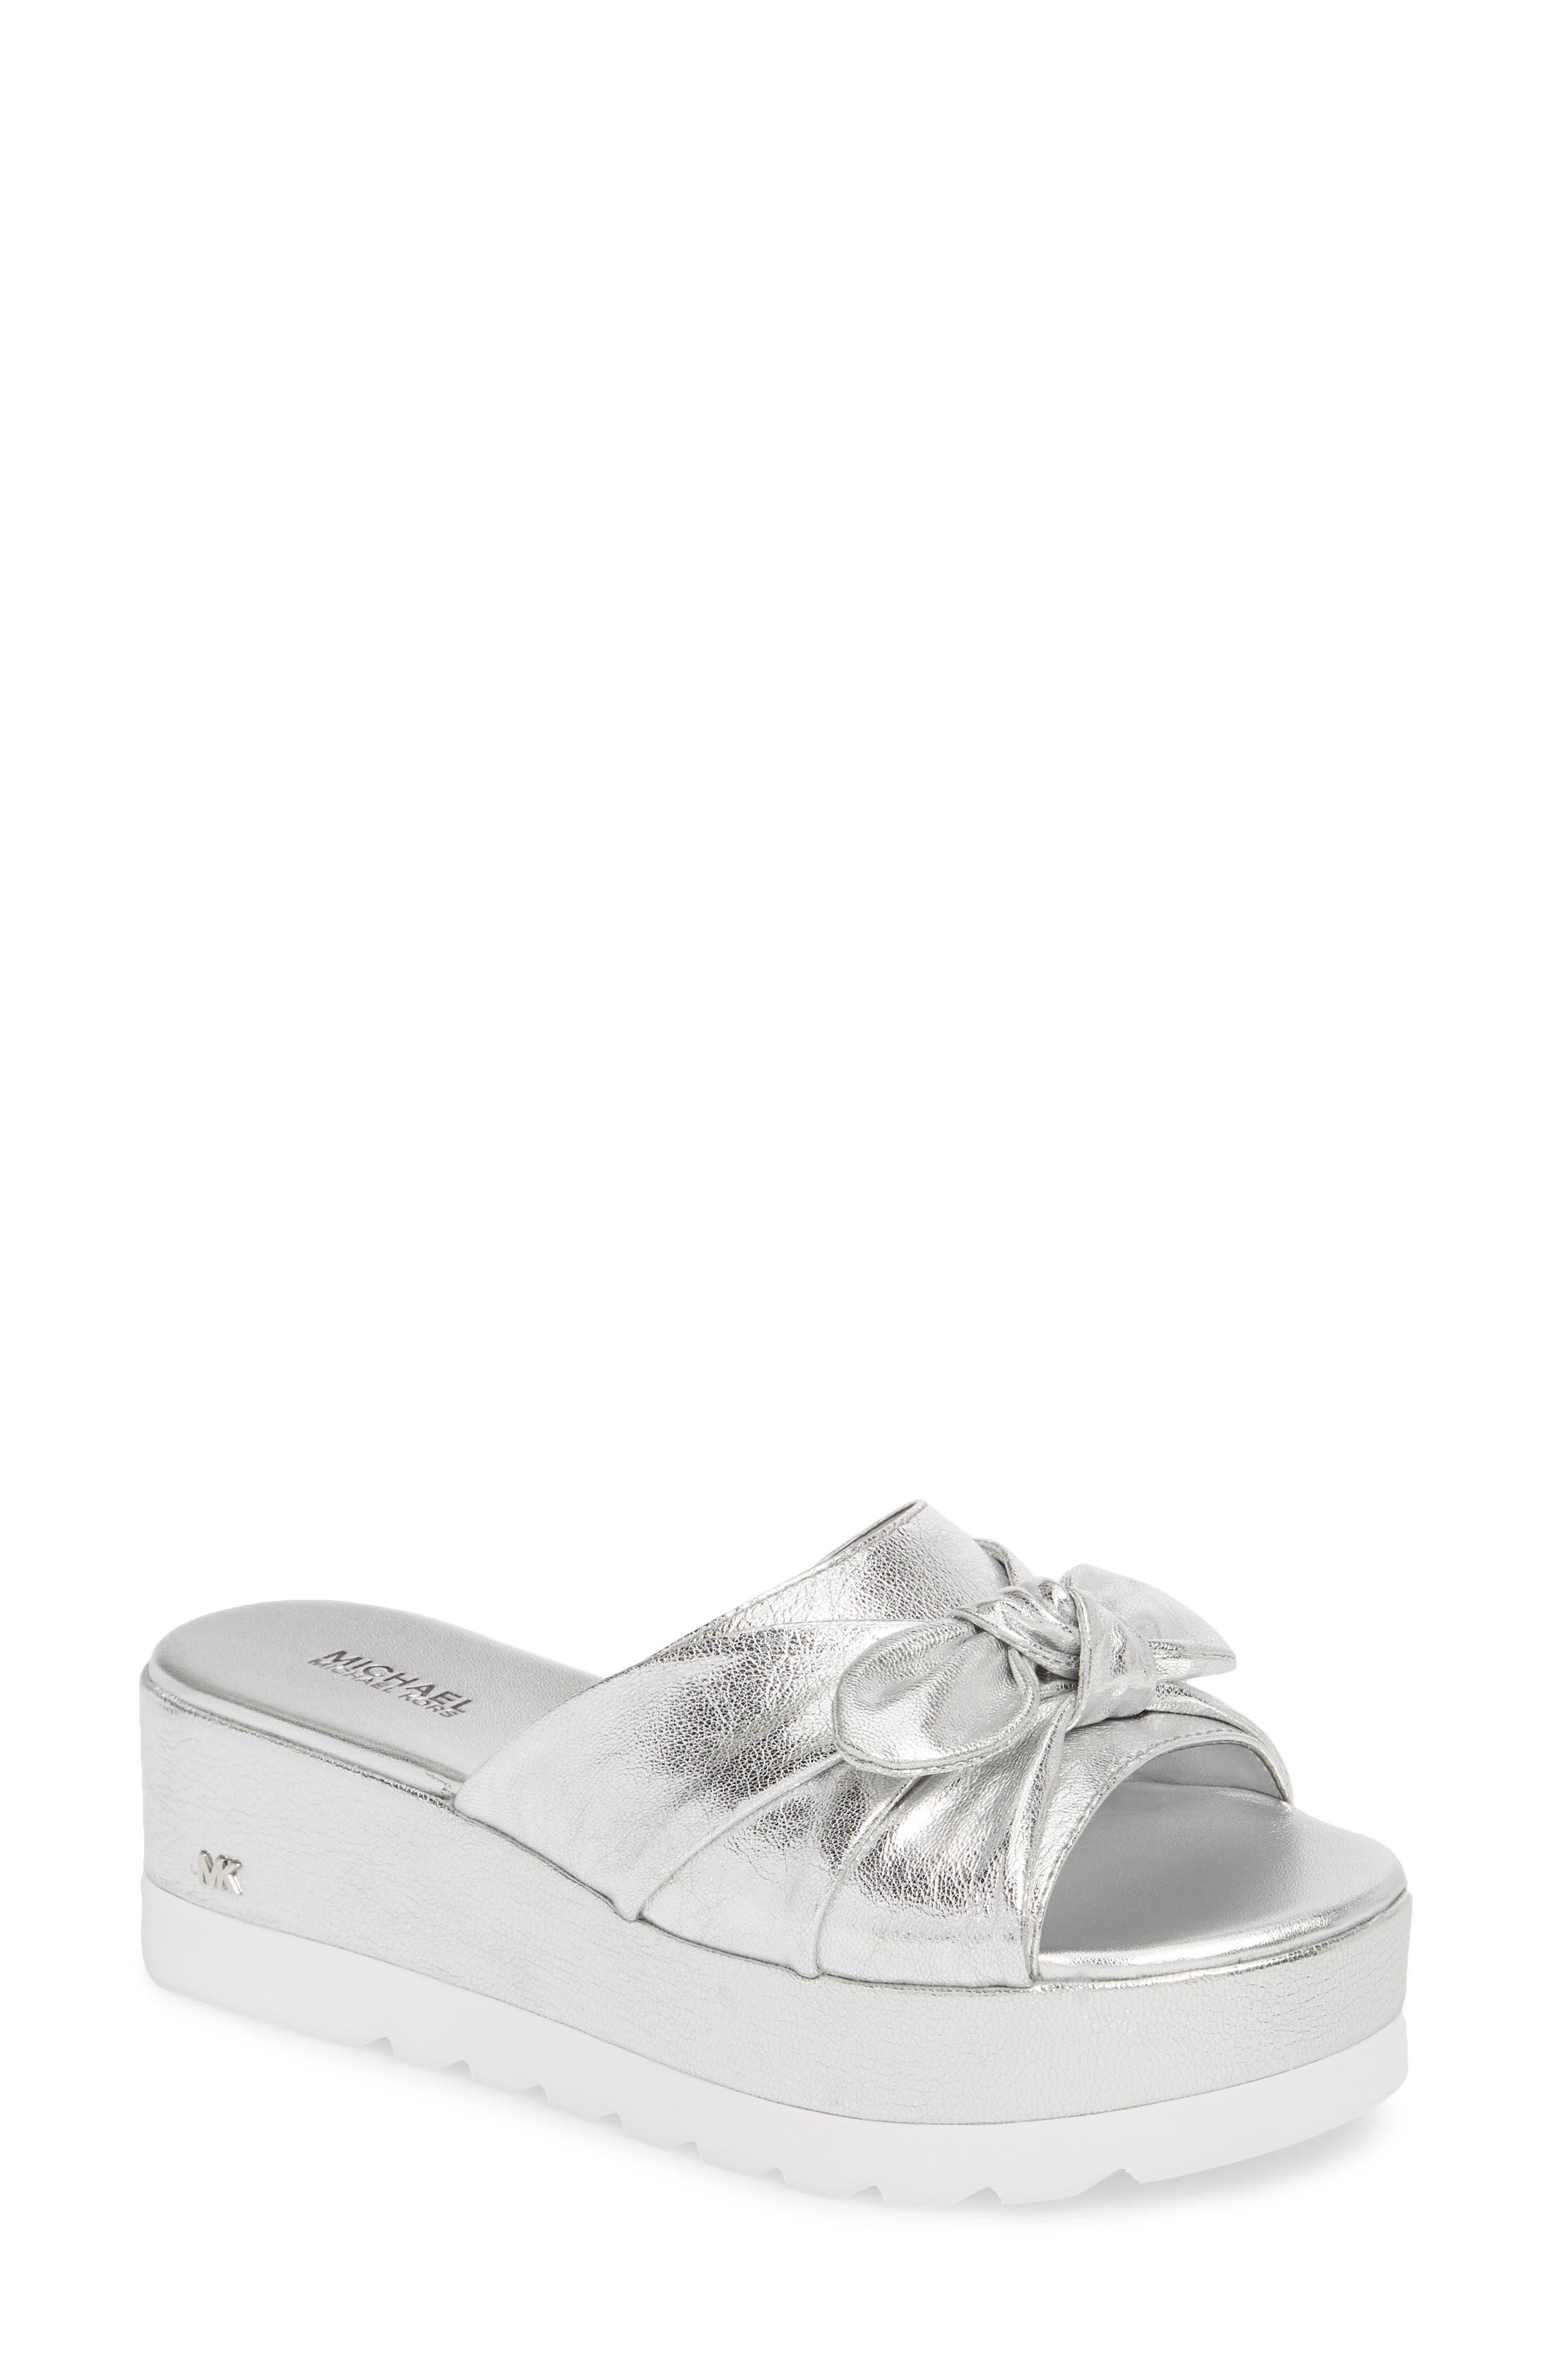 Pippa Platform Slide Sandal,                             Main thumbnail 1, color,                             Silver